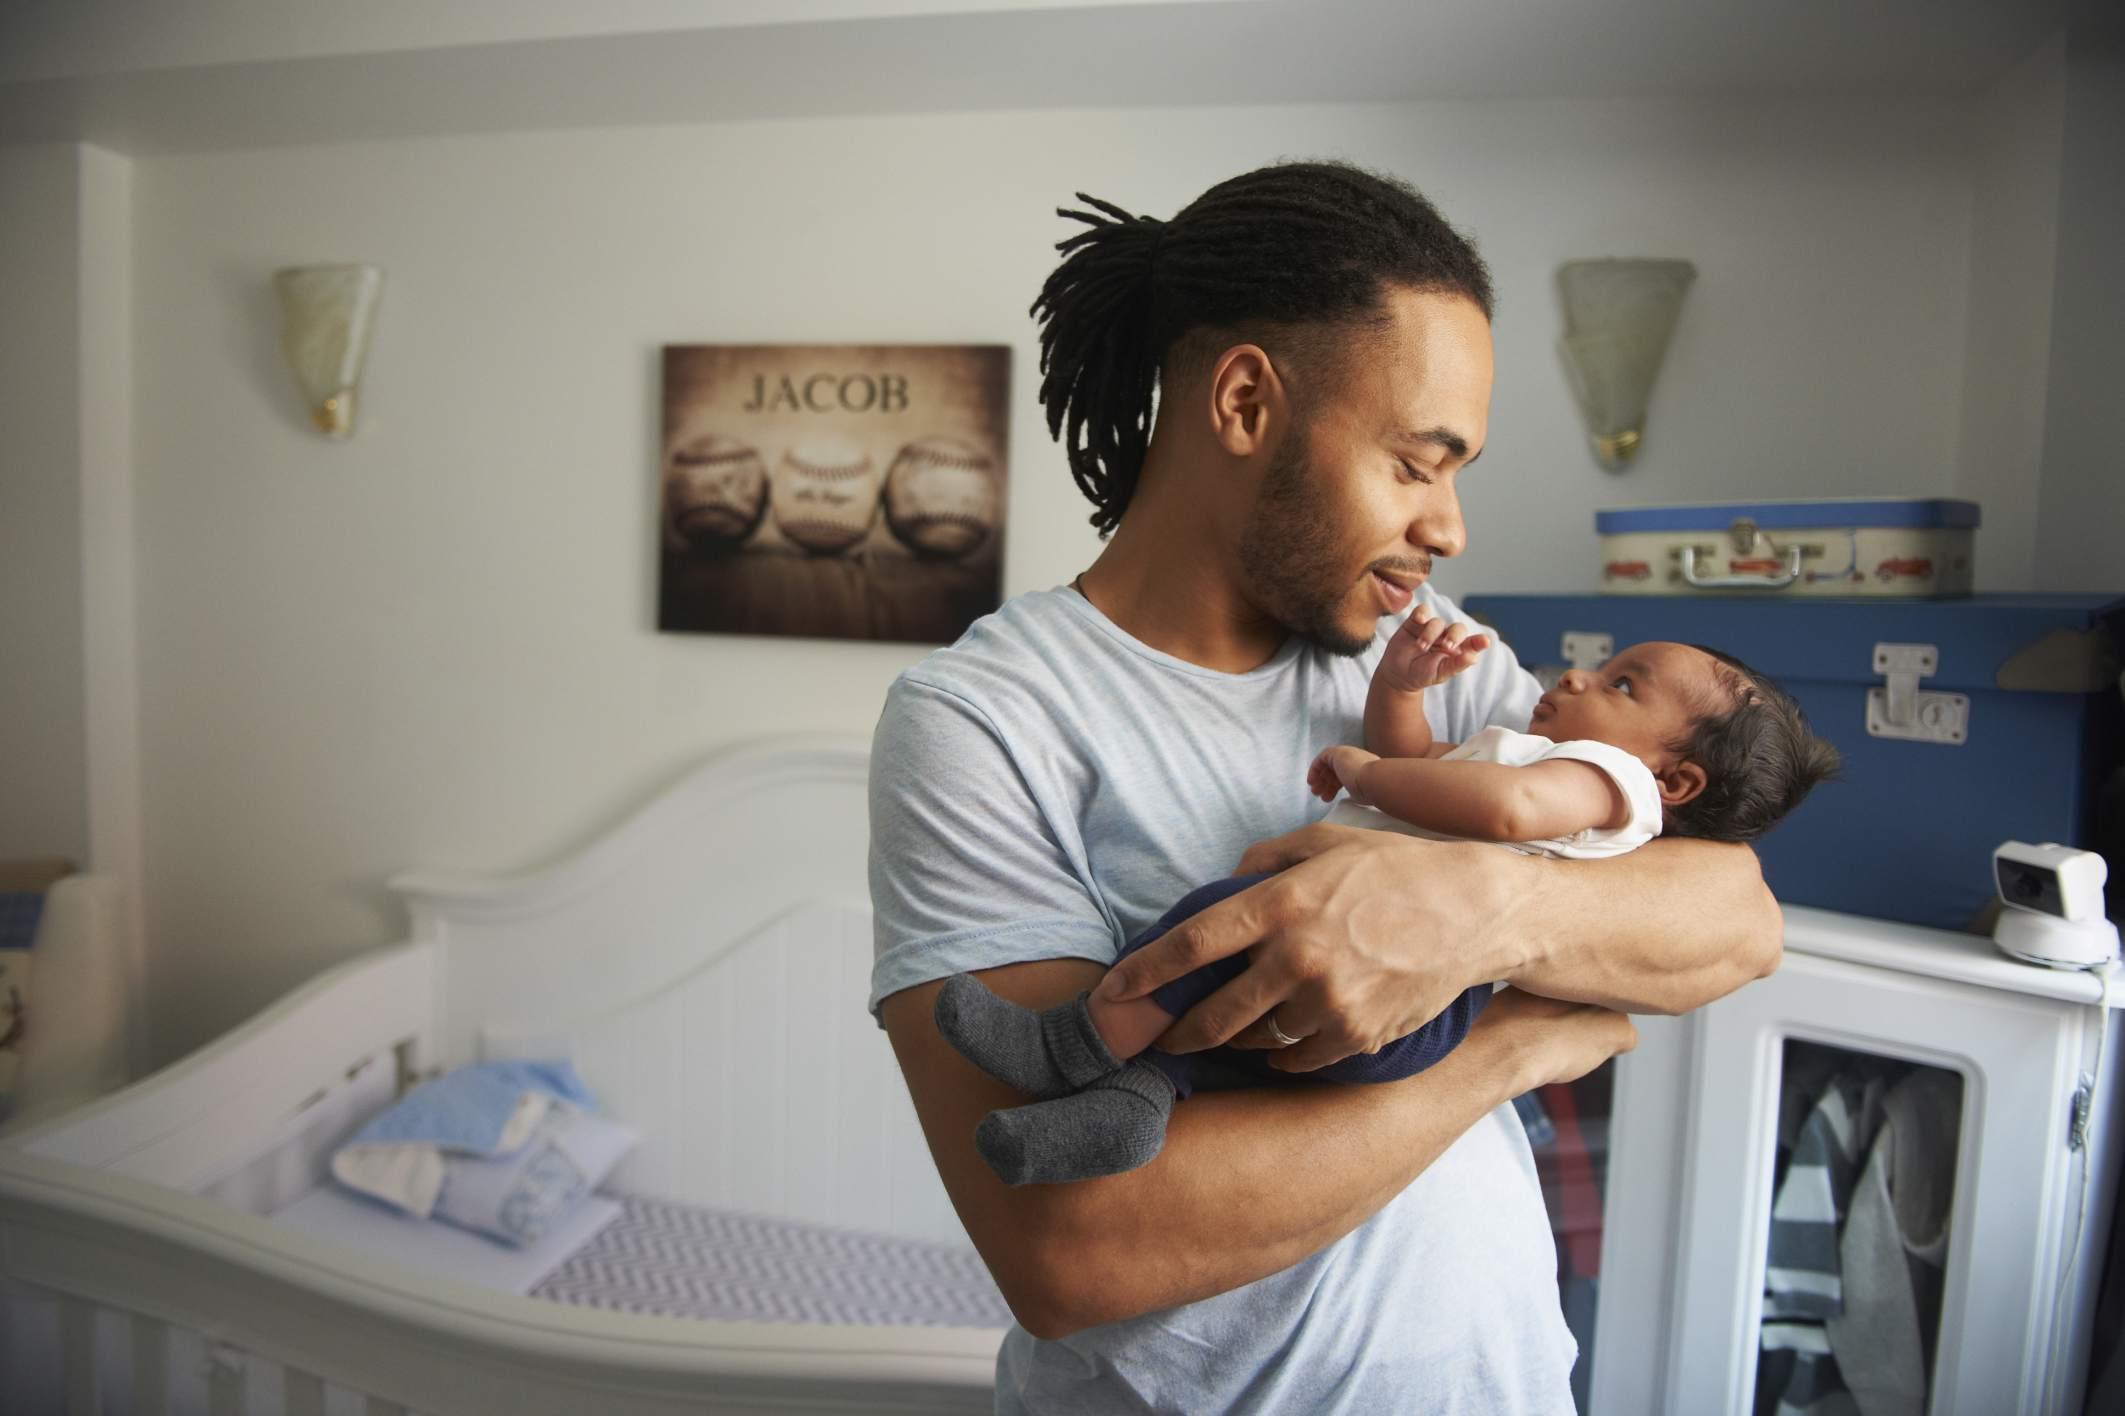 Father cradling newborn baby in nursery